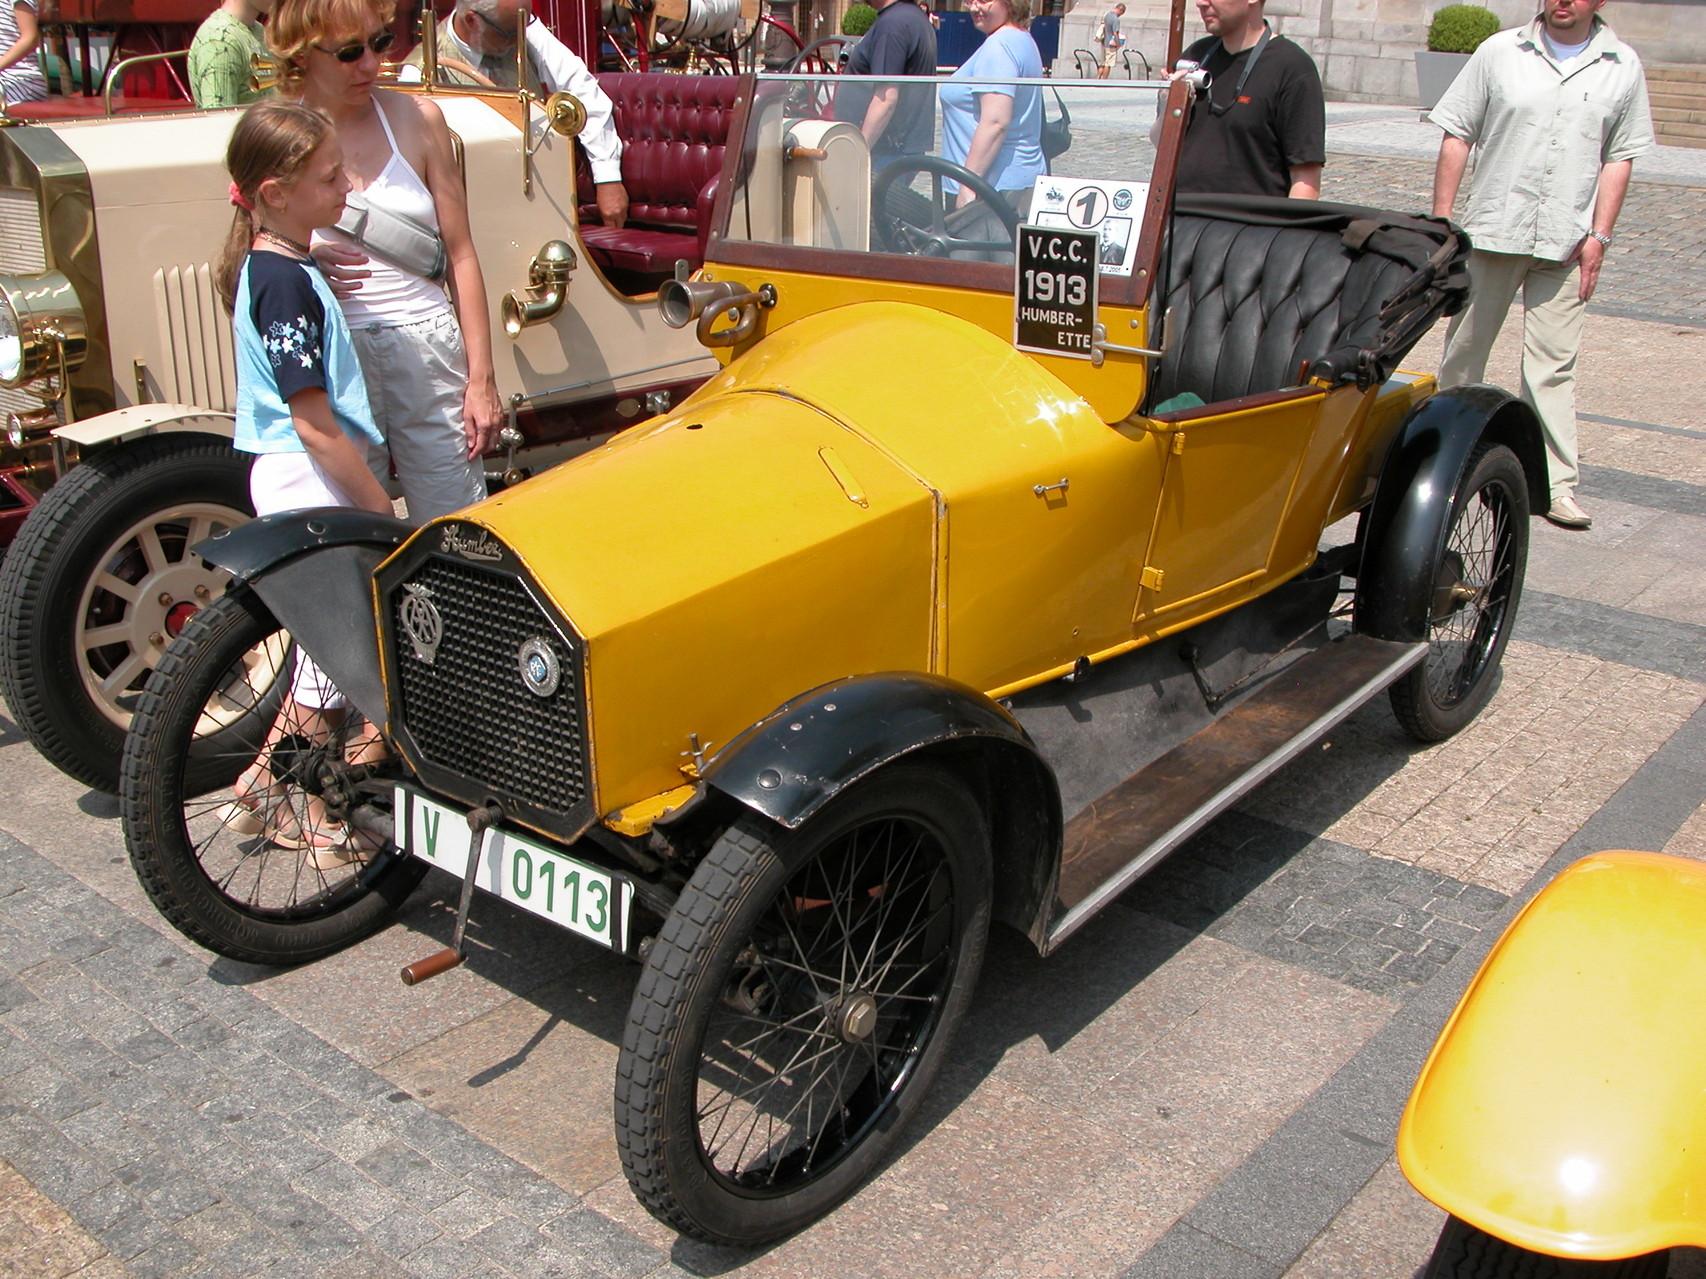 Veicoli storici - auto e moto d'epoca